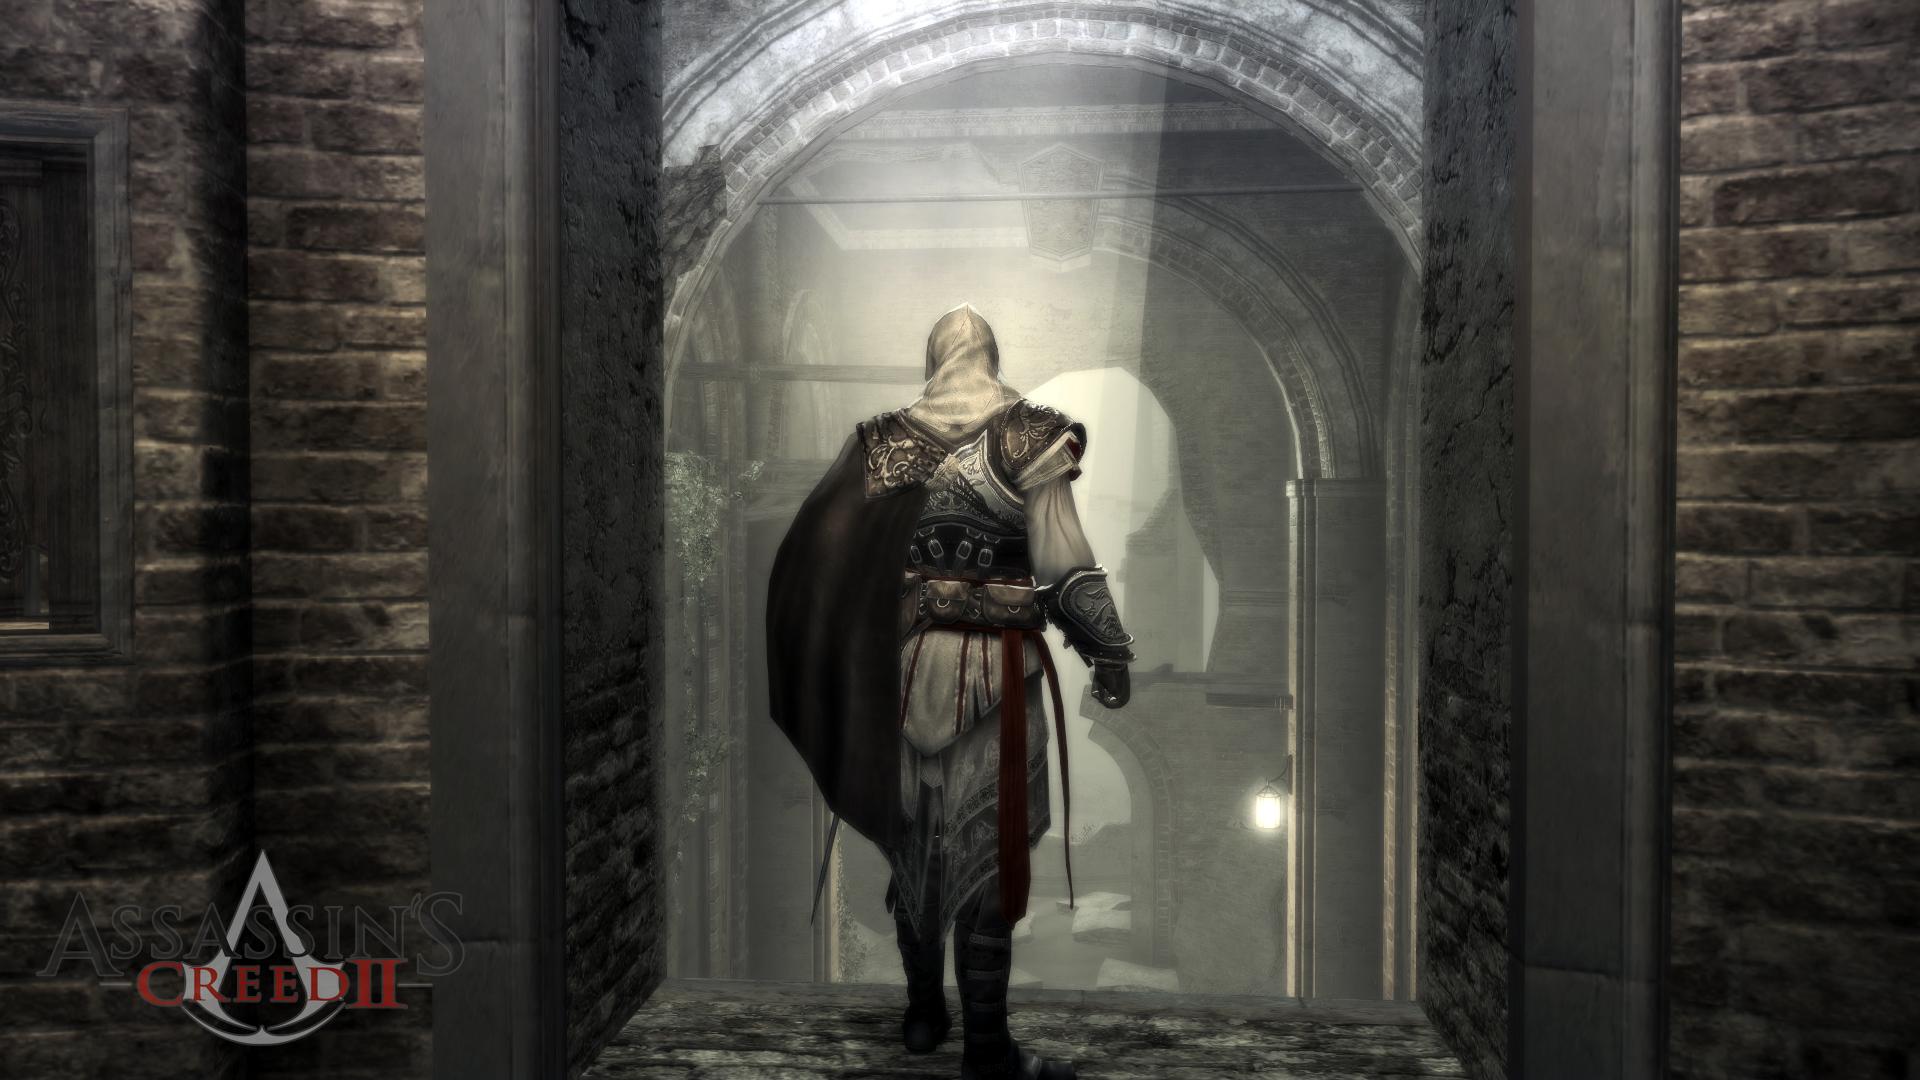 Assassin Creed Wallpaper by rausan on DeviantArt